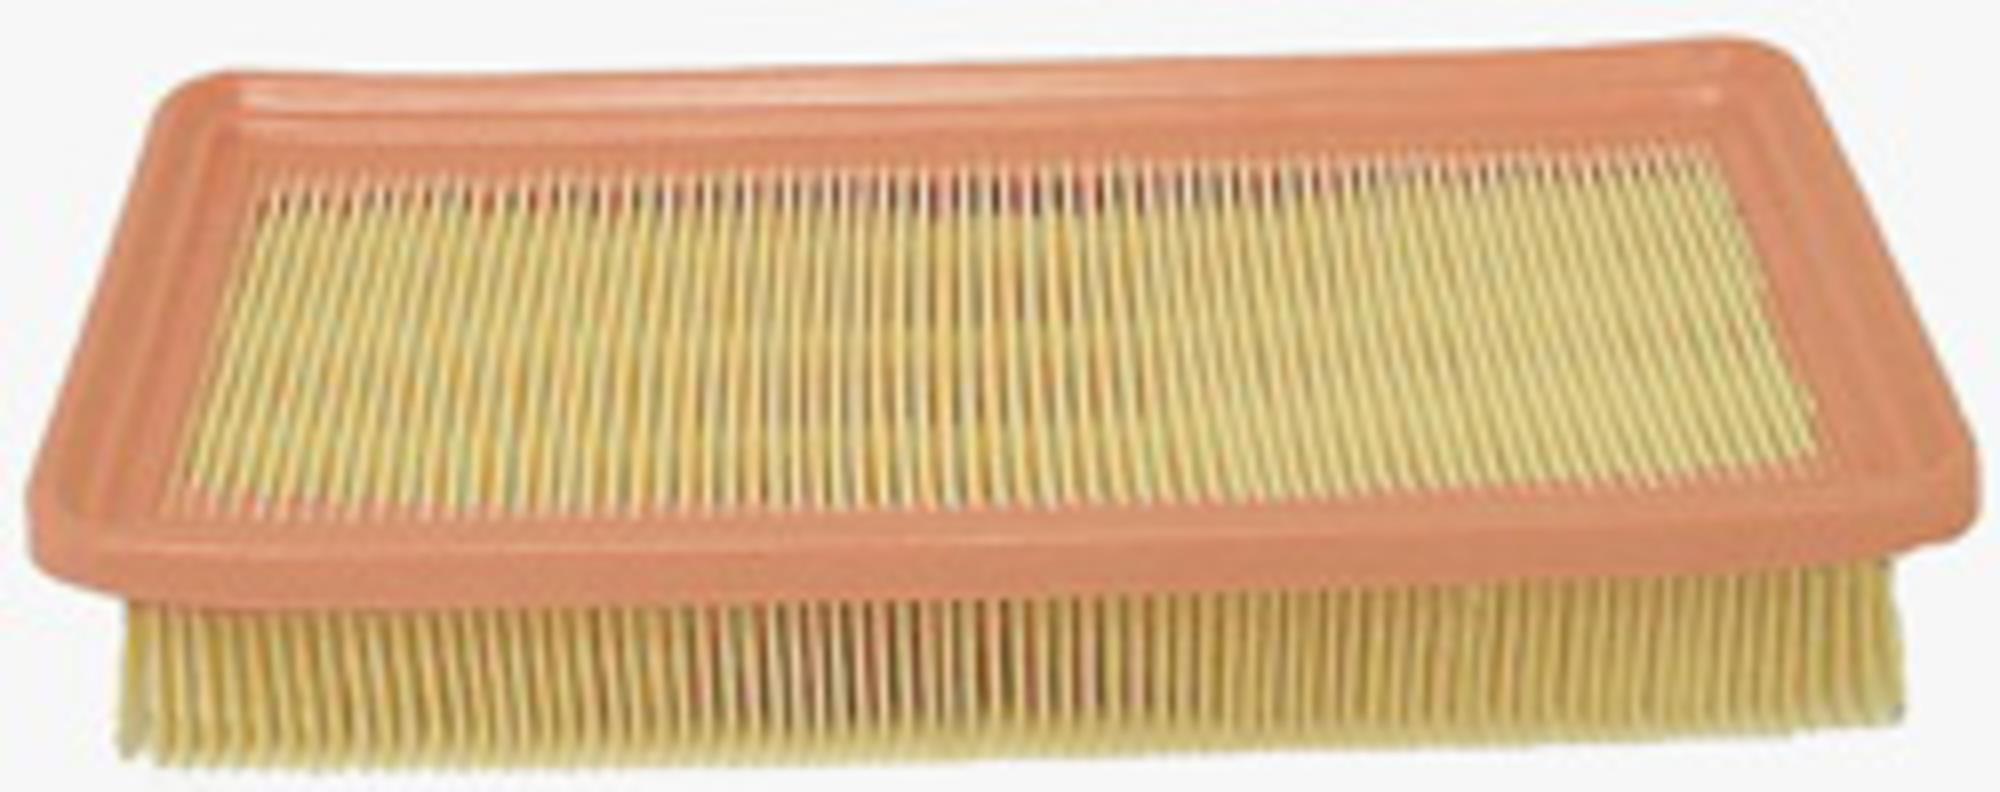 Mapco 60524 air filter mapco 60524 air filter publicscrutiny Choice Image